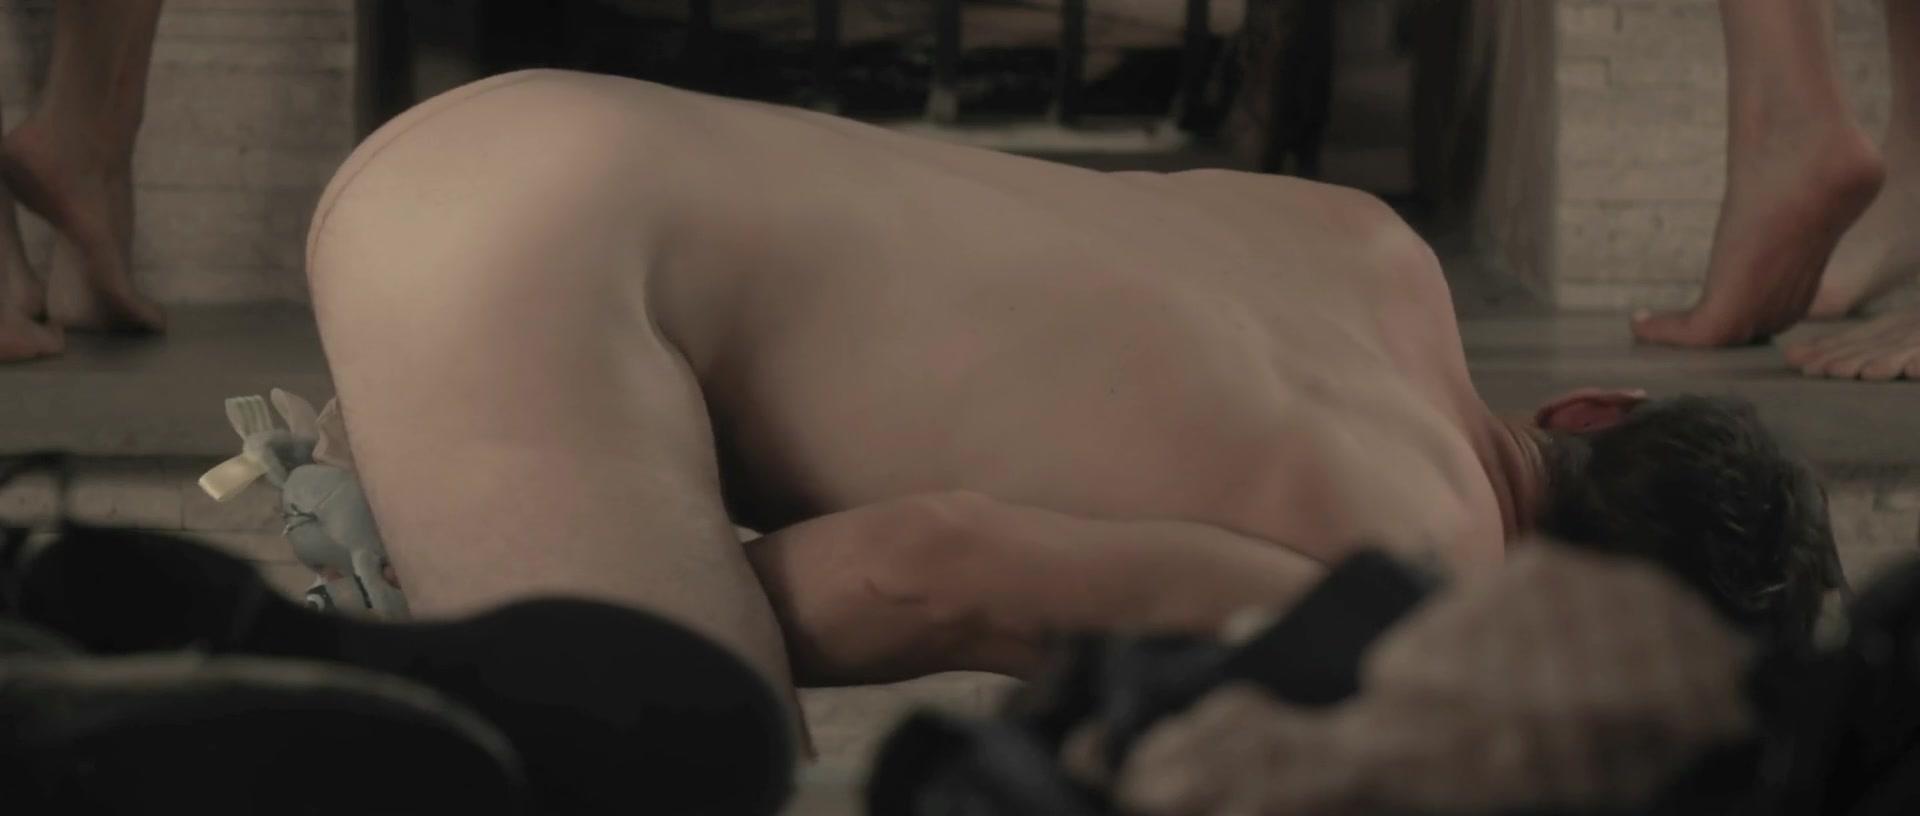 Amy acker sex scene